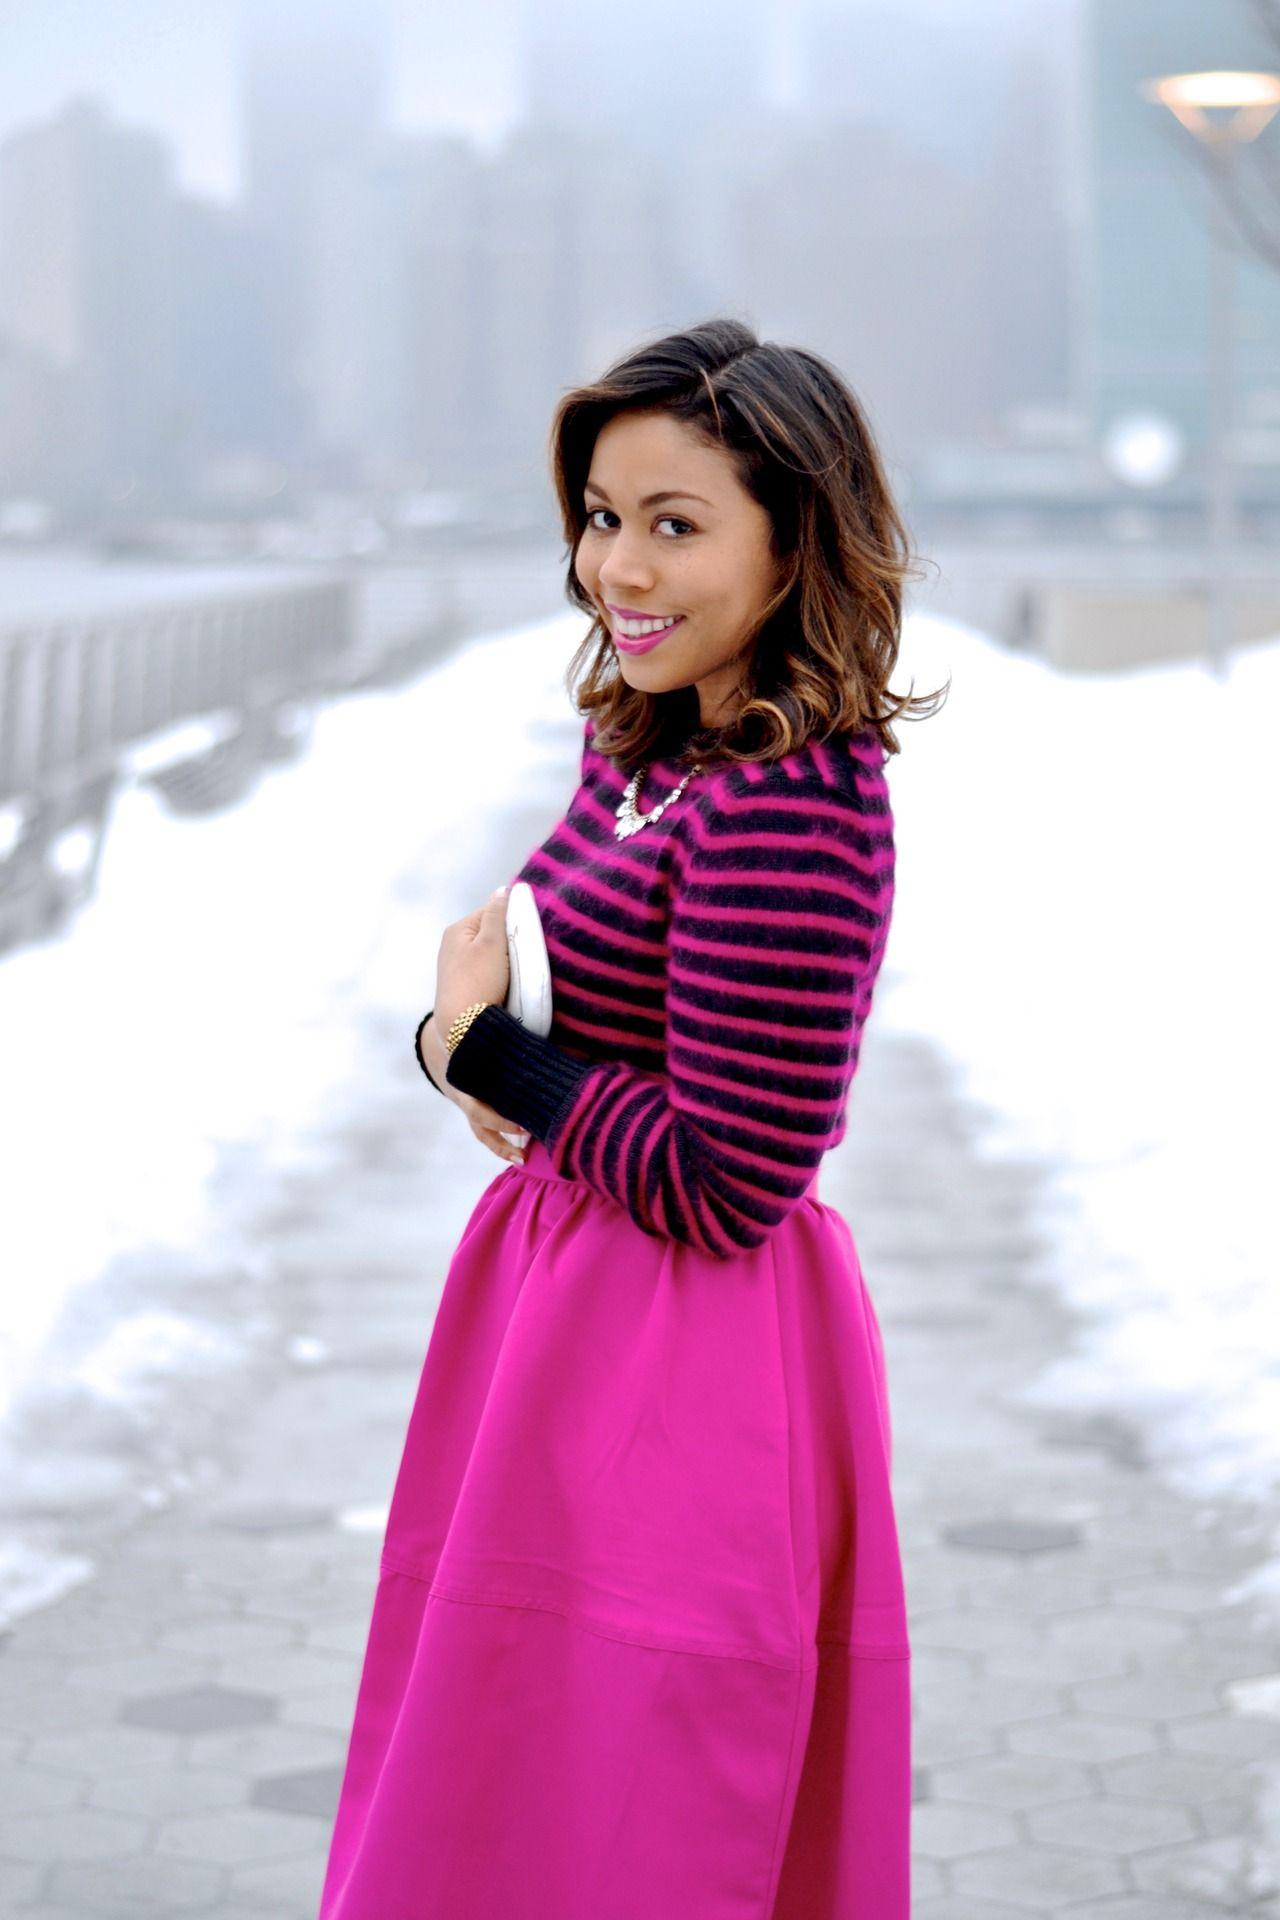 ad44307da9 Valentine's Day Style Inspiration | My Style | Fashion, Style ...